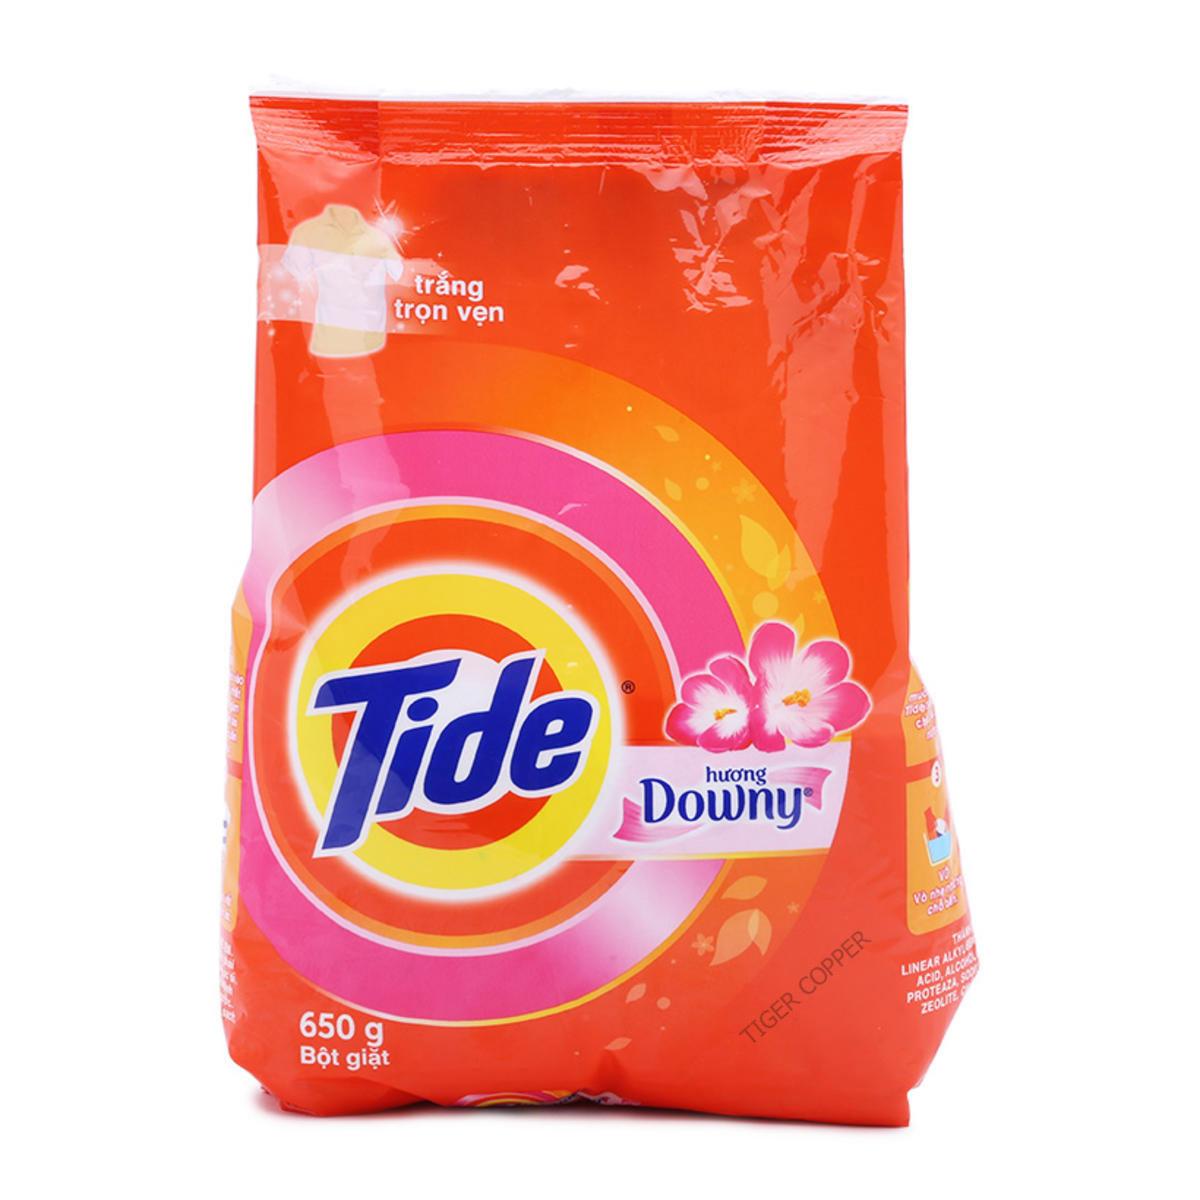 tide-downy-650g